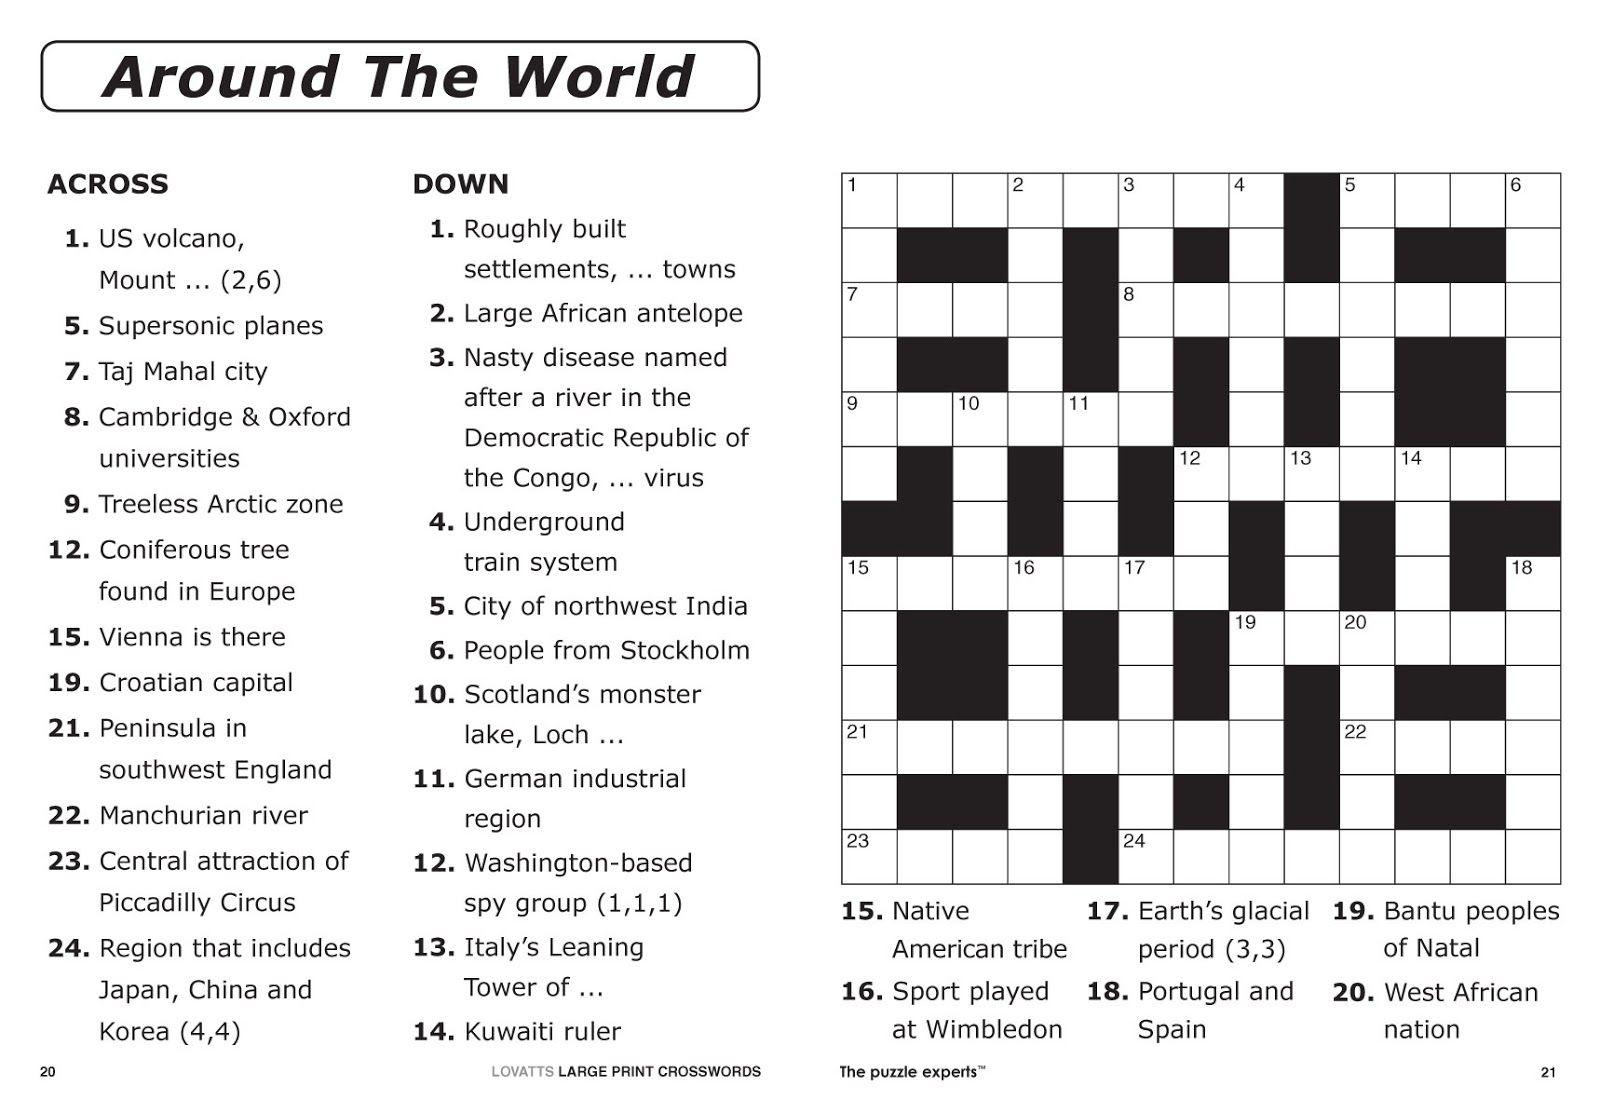 Free Printable Large Print Crossword Puzzles | M3U8 - Printable Japanese Crosswords